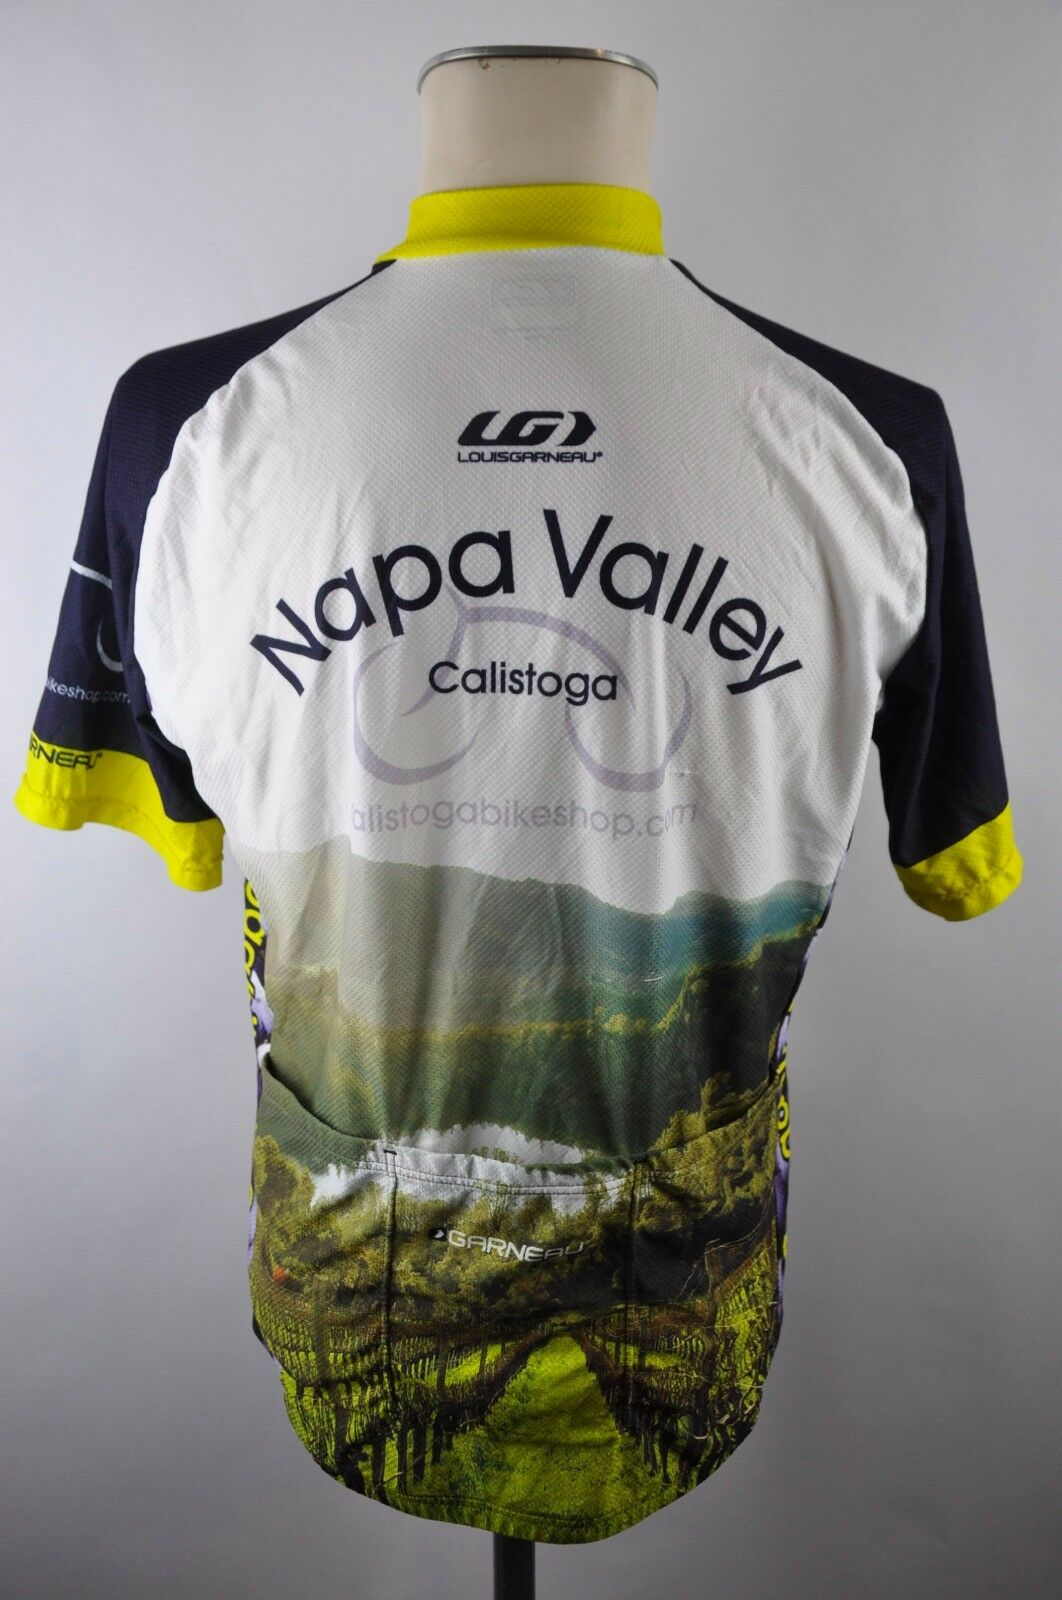 Louis Garneau Nappa Nappa Nappa Valley CYCLING JERSEY MAGLIA Ruota Maglia Taglia M 56m 21d 6bfe10